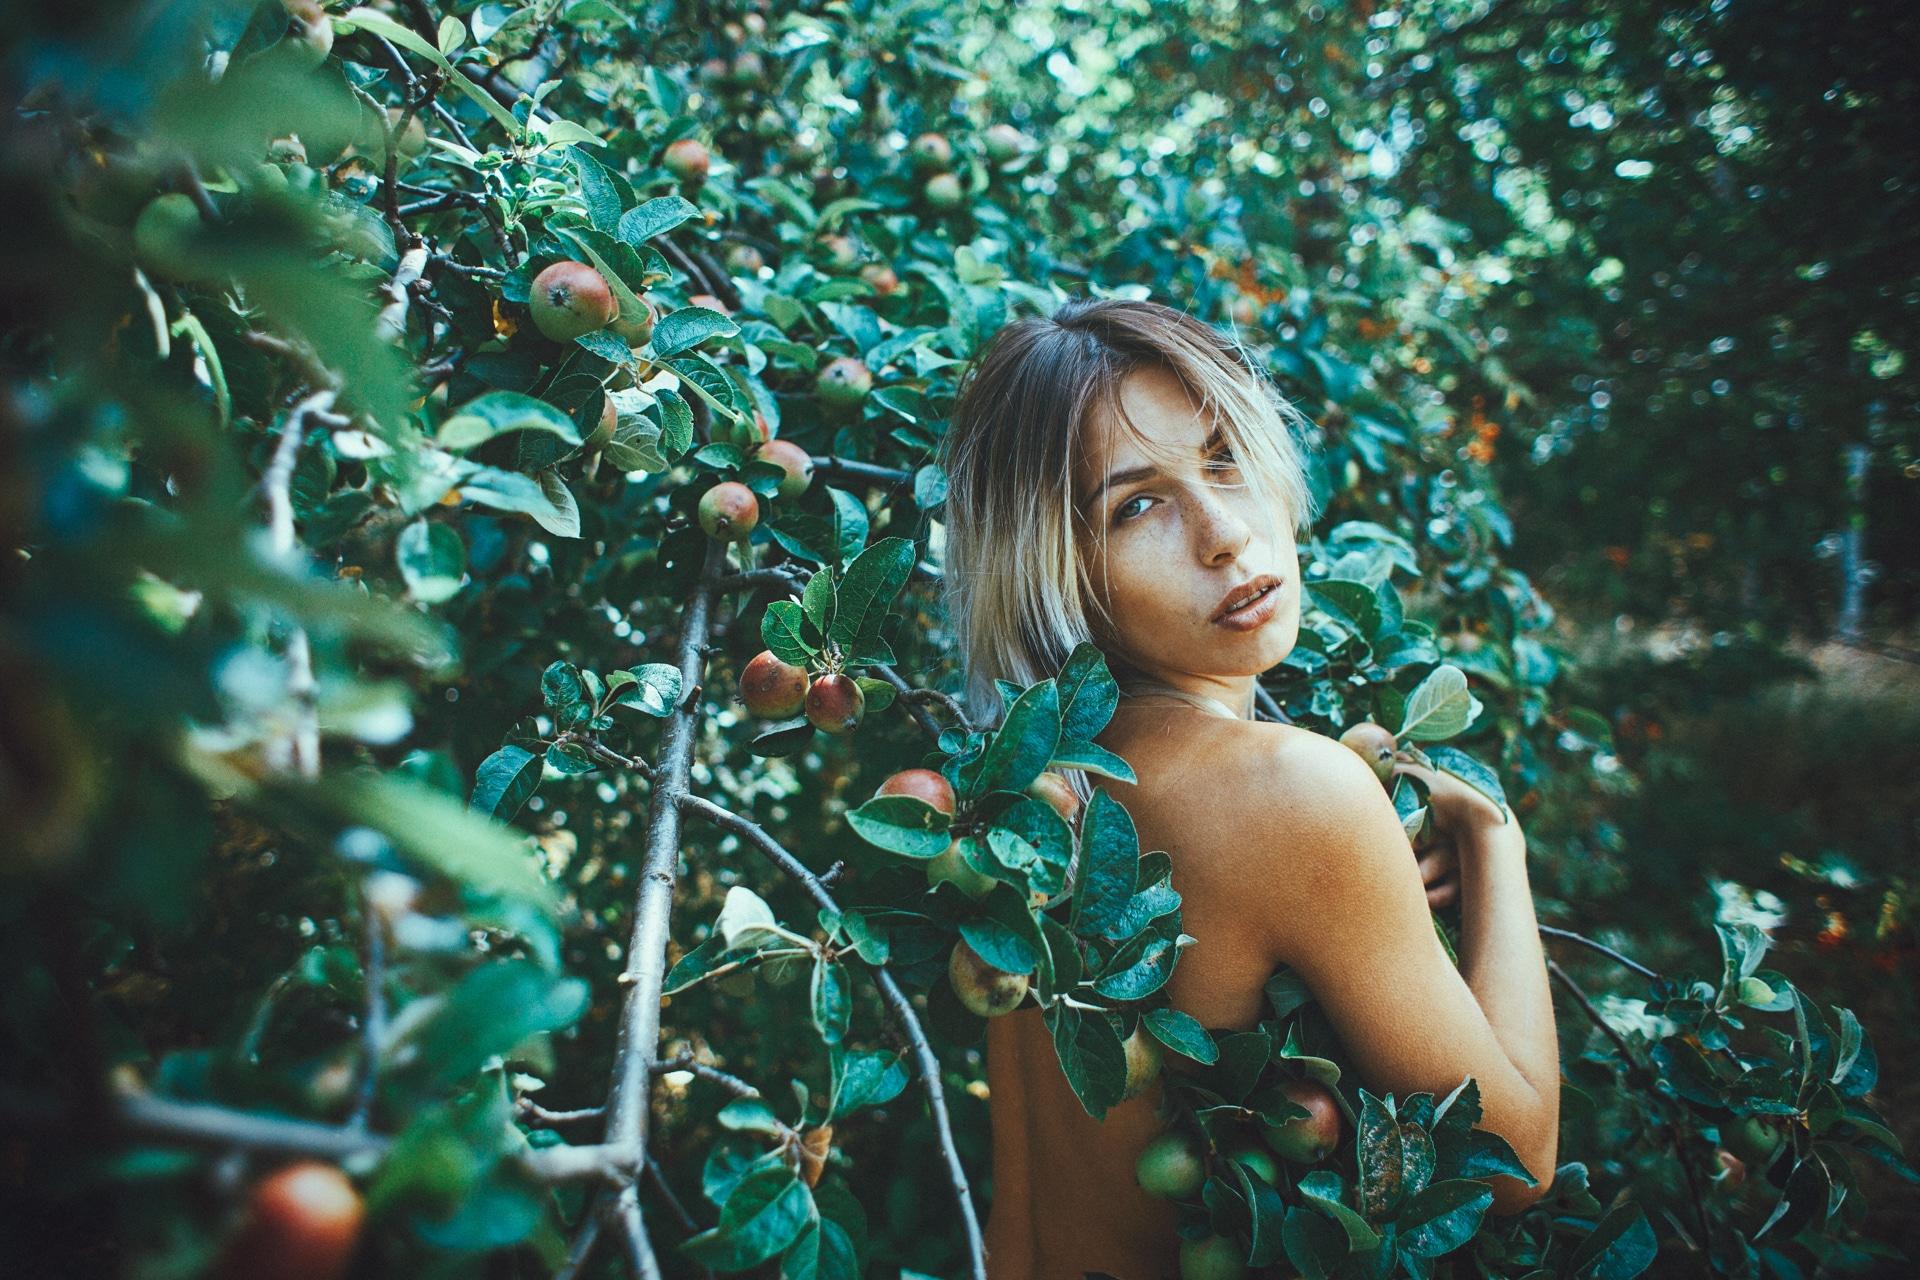 Vanesse_Sommer-7026-Edit